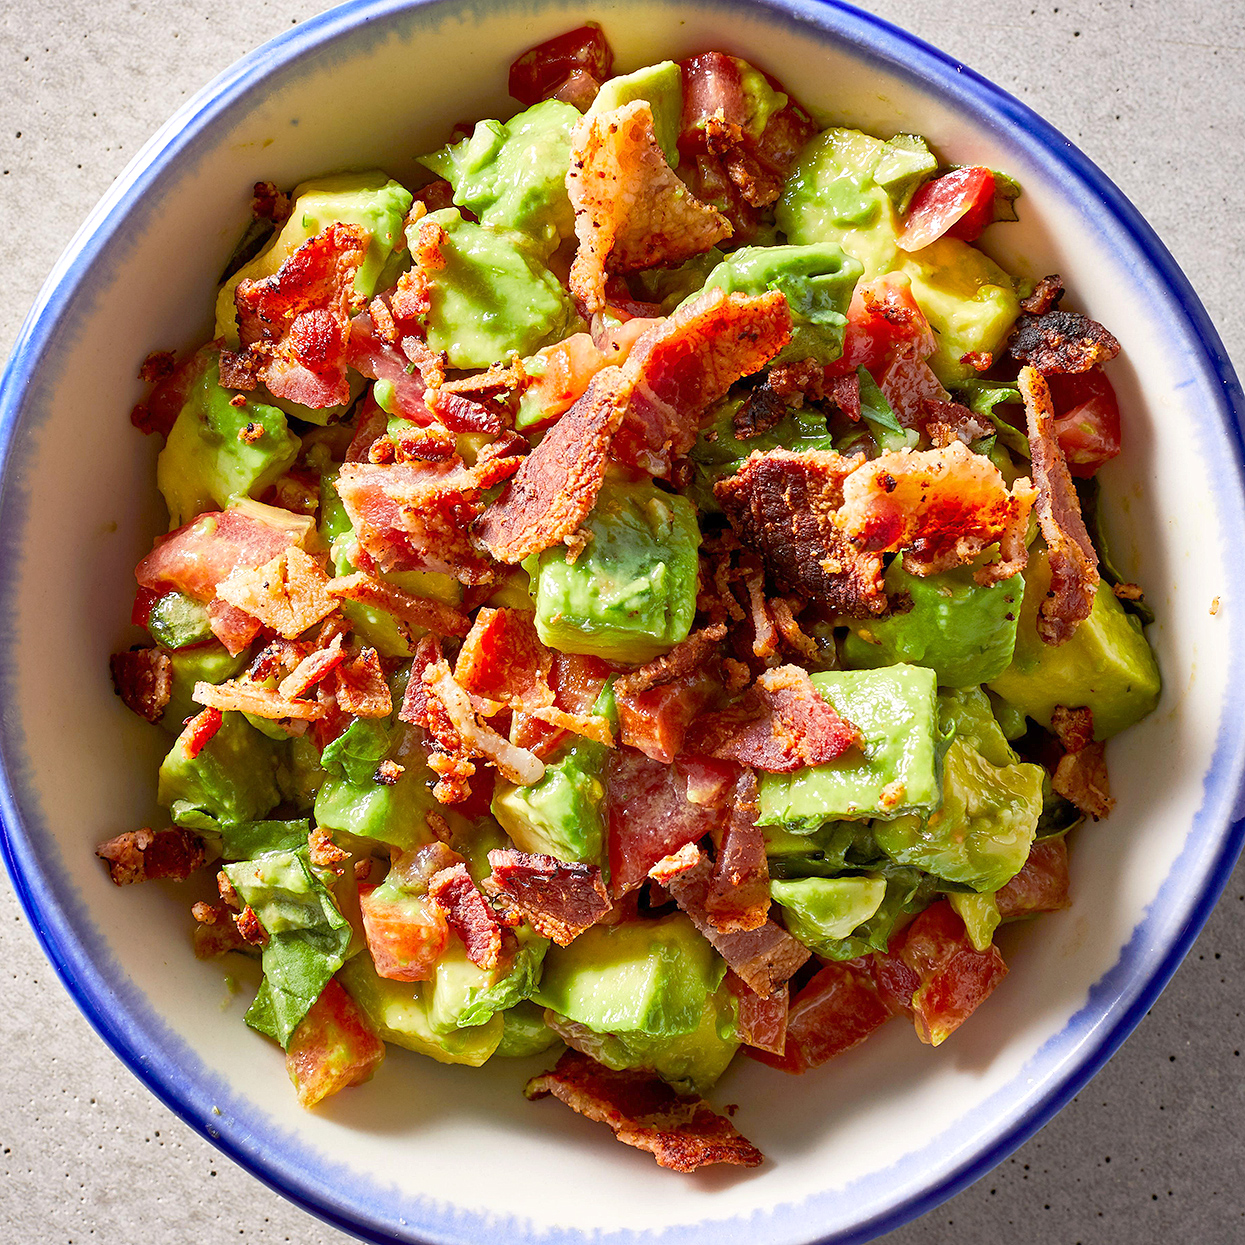 bacon-tomato guacamole in bowl